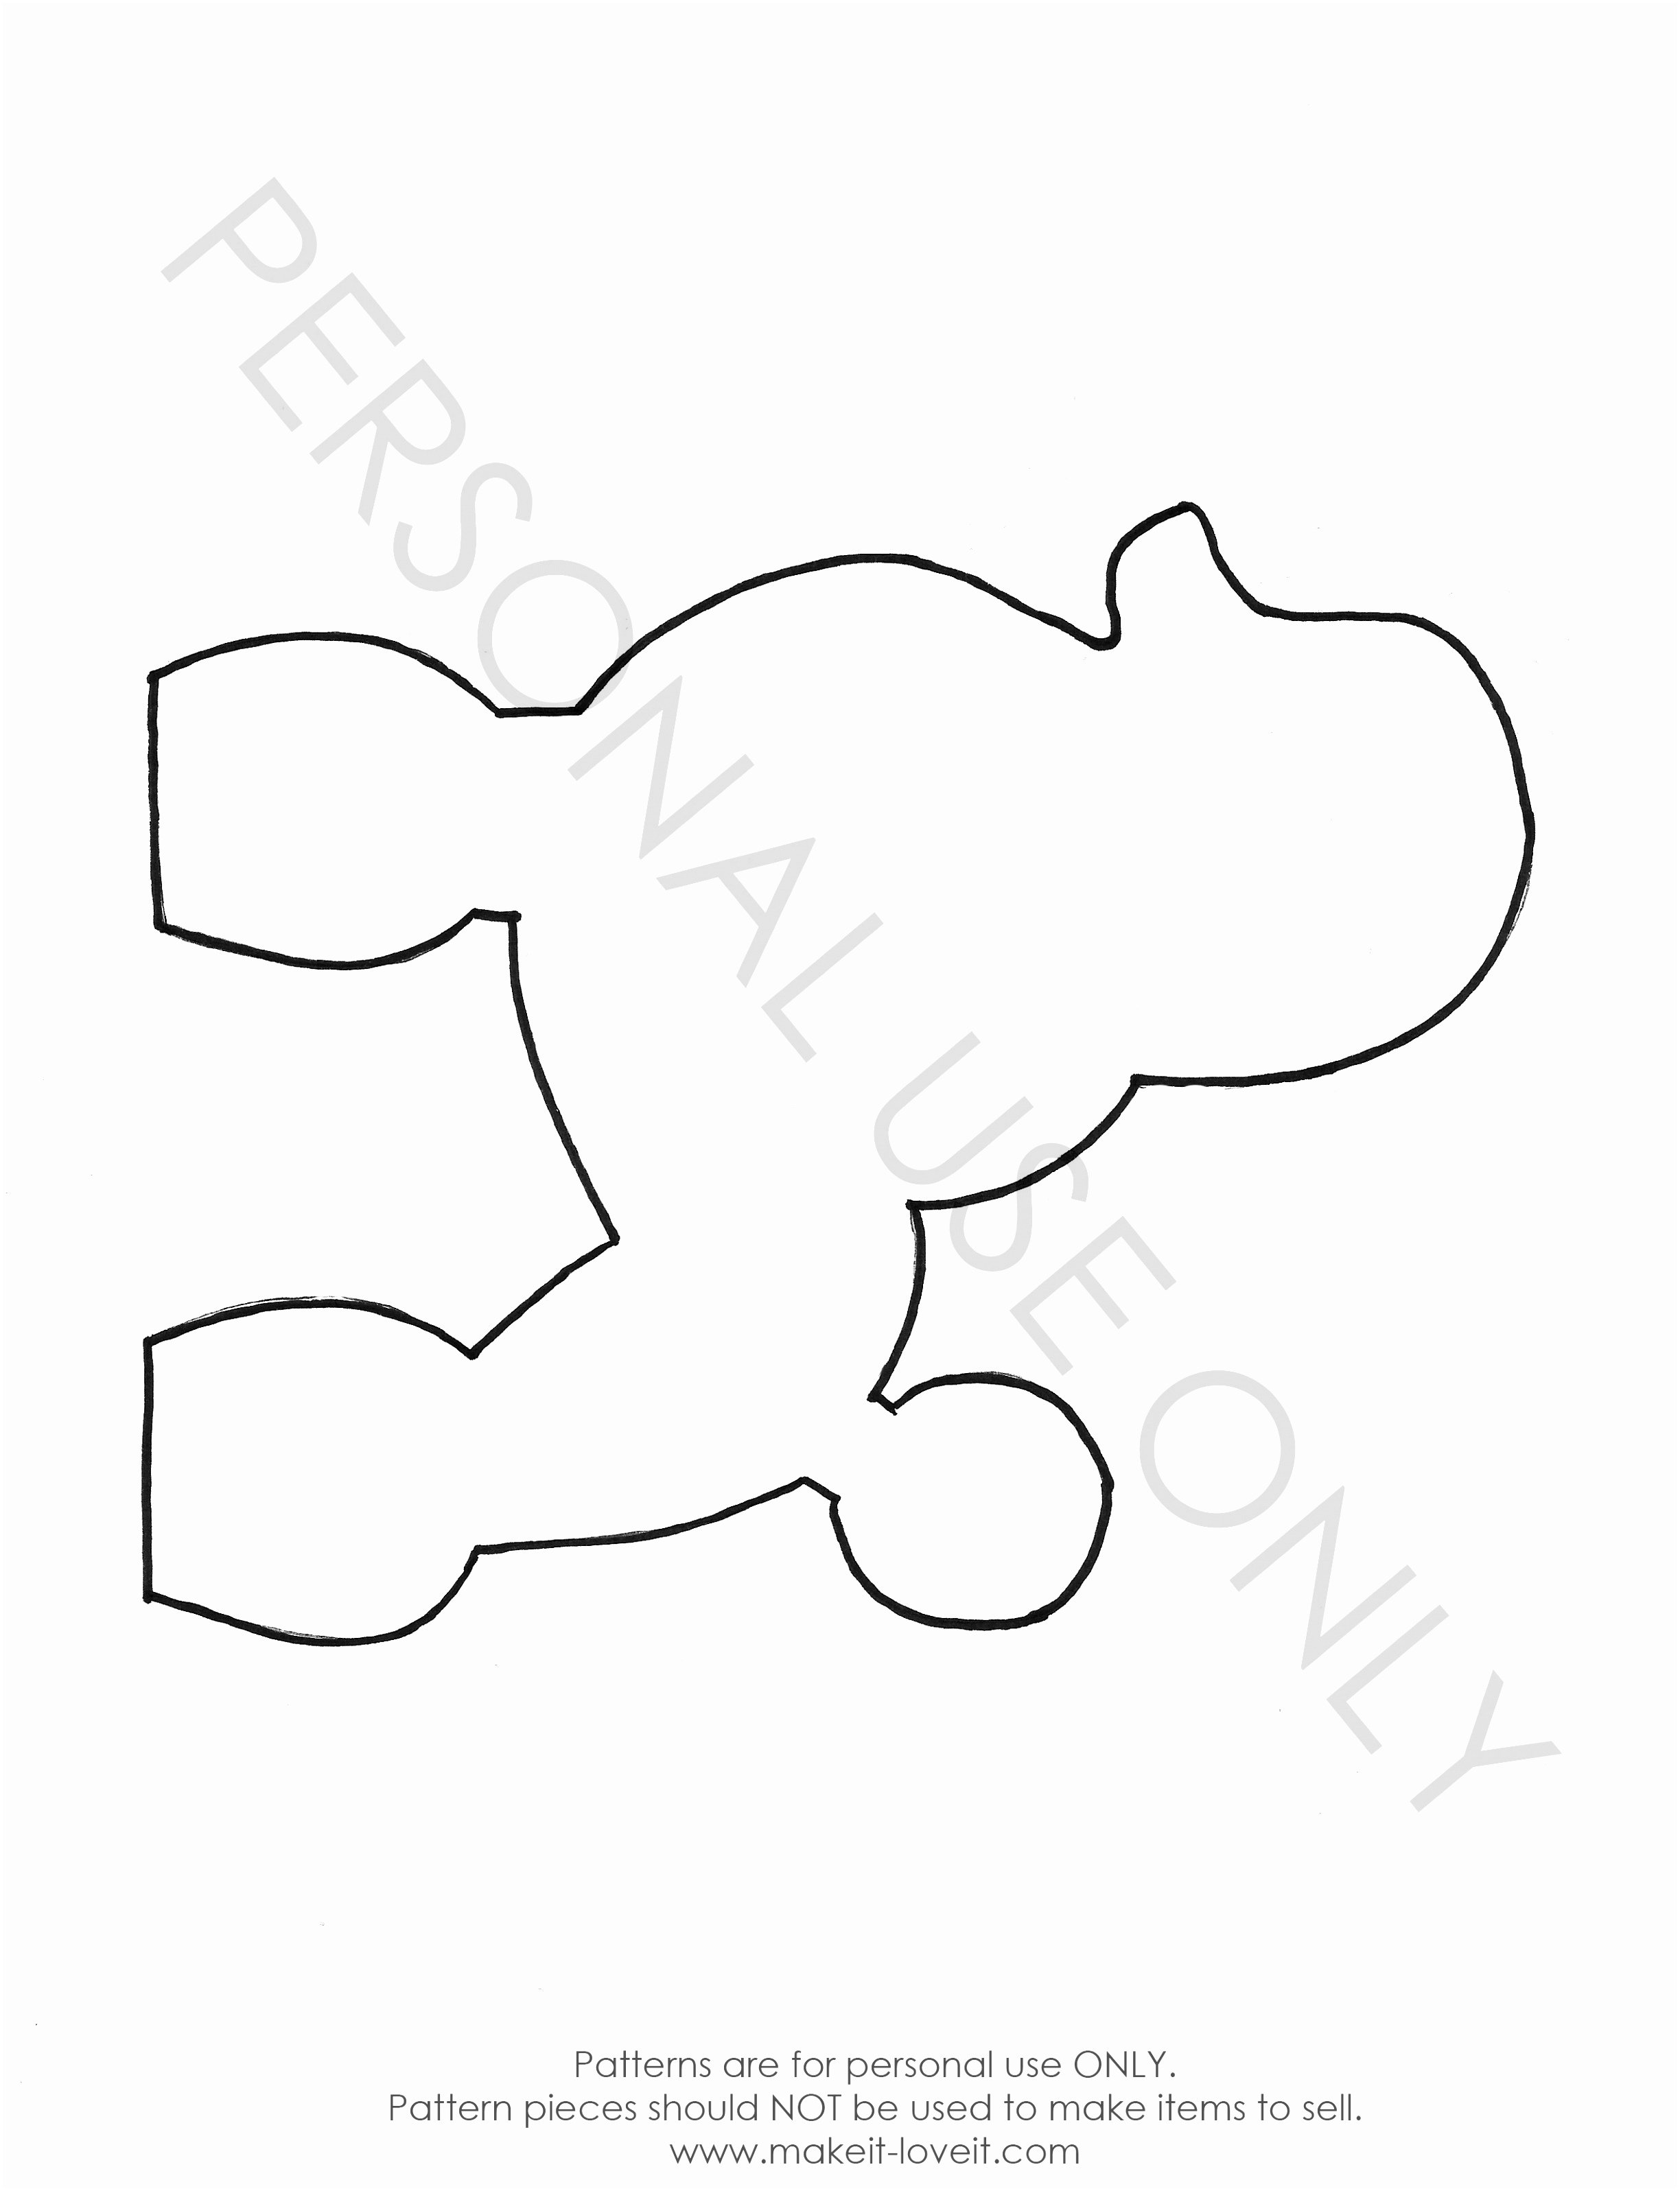 Poodle Skirt Drawing At Getdrawings